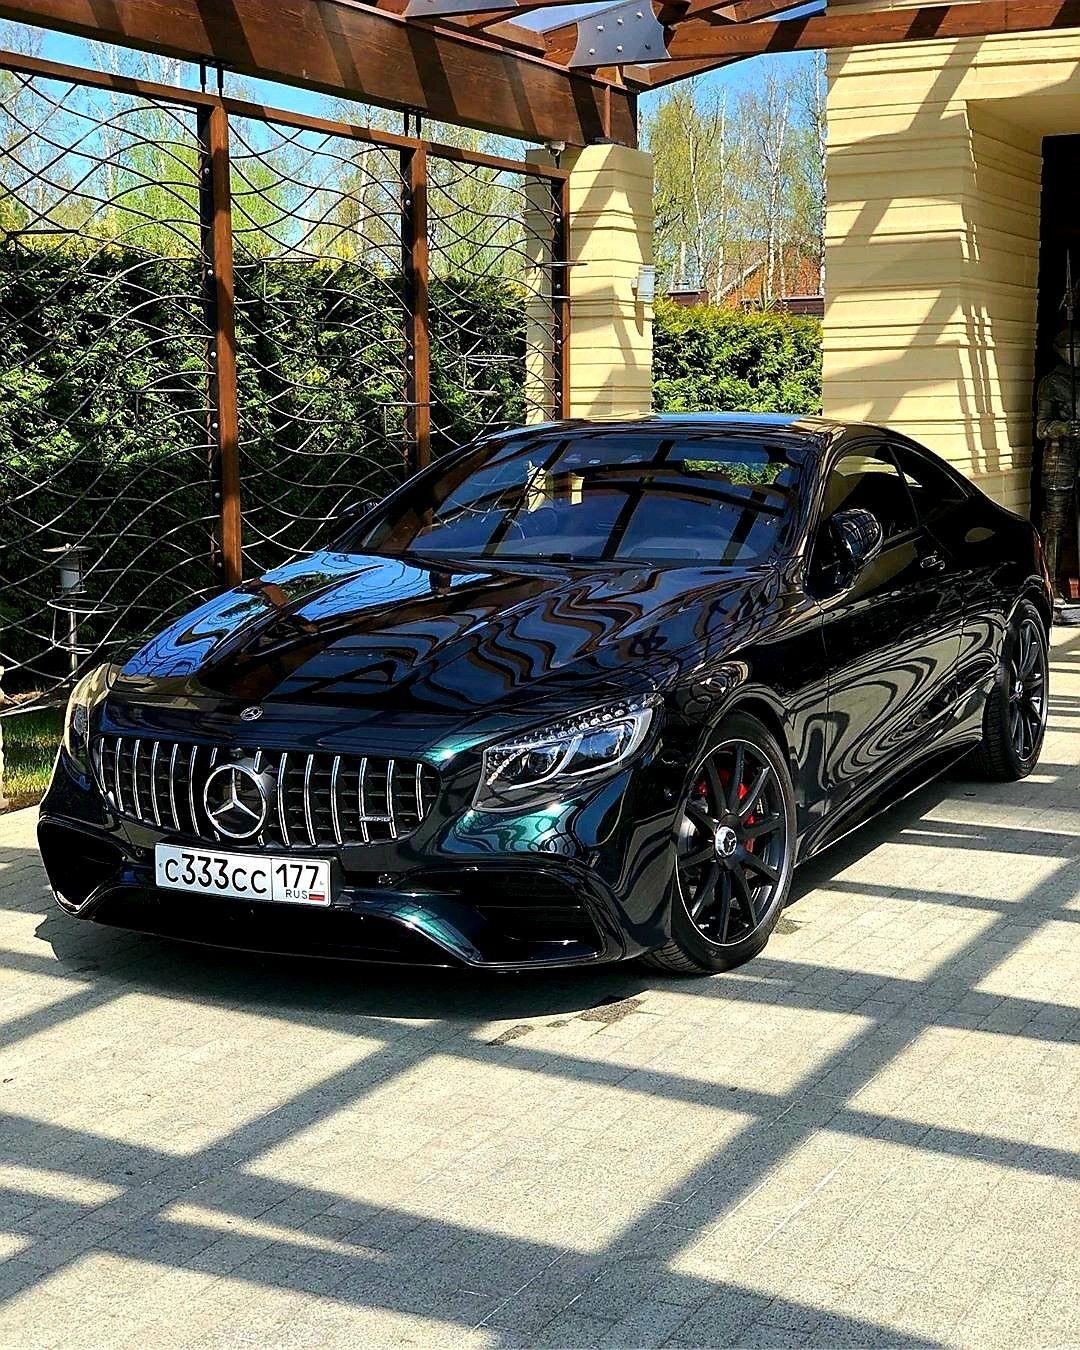 2019 Mercedes Amg S63 Coupe 4matic 4 0 L V8 Biturbo 612 Hp